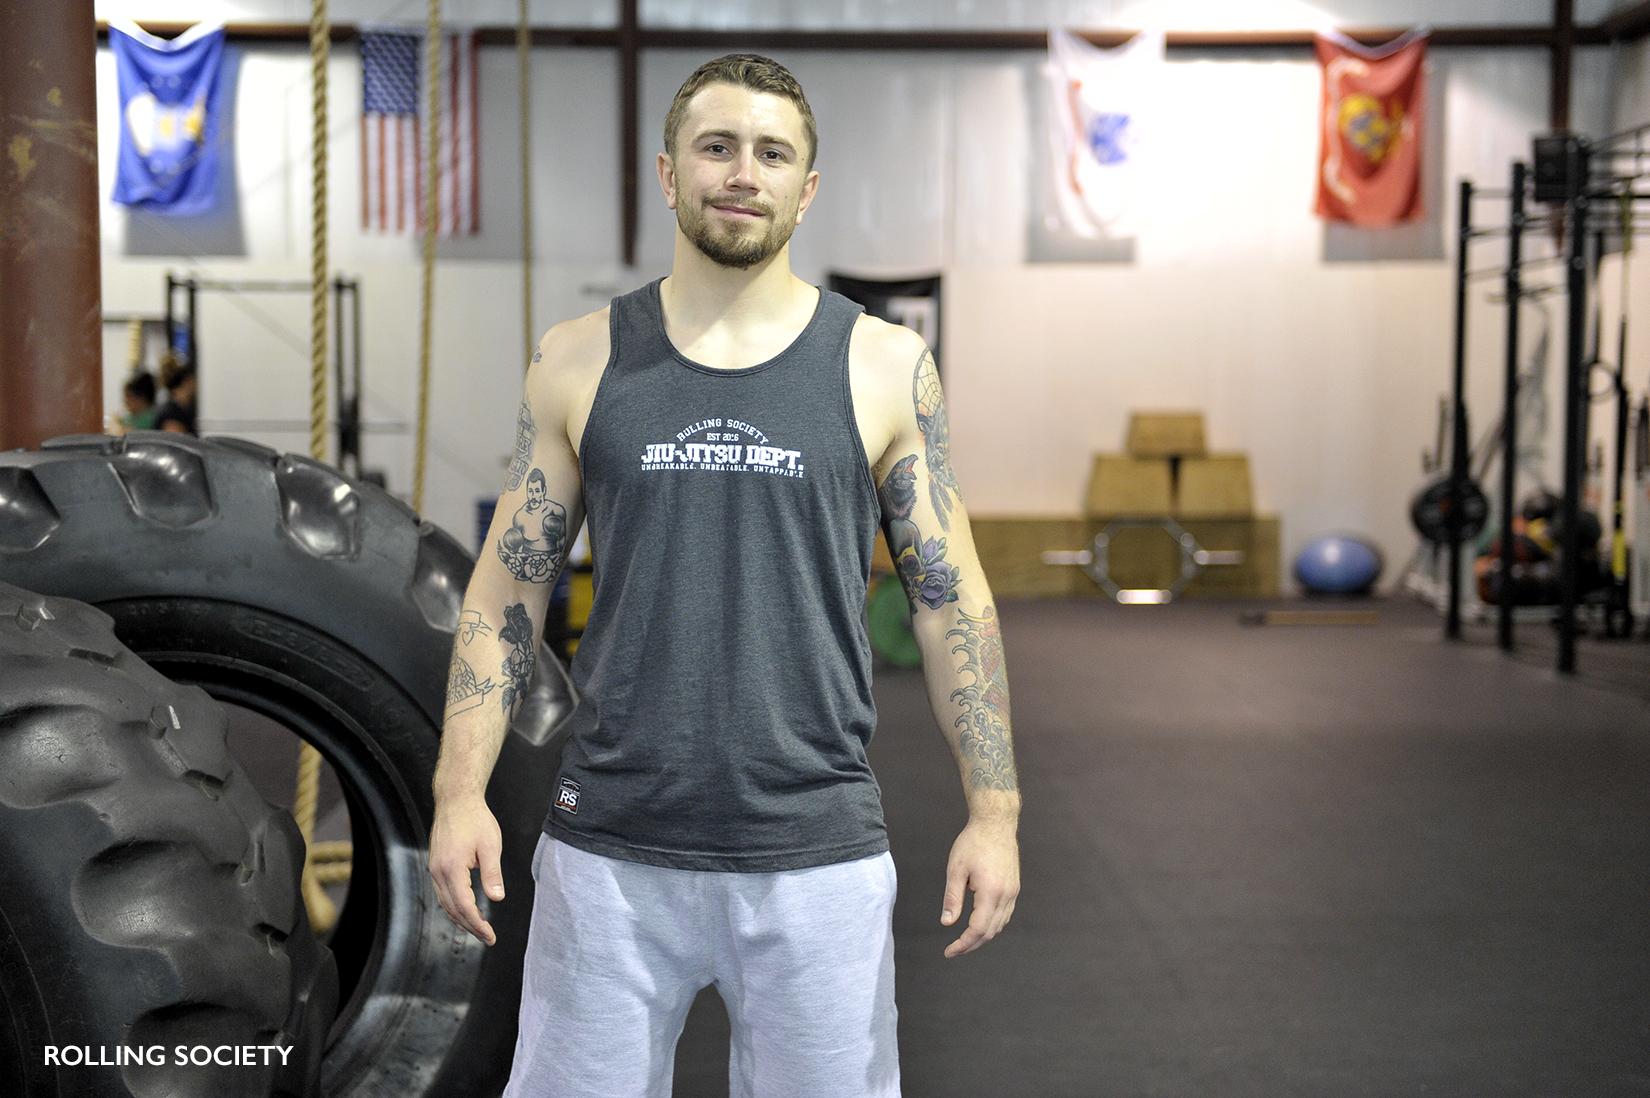 Ryan Rizco MMA Fighter, Wrestler and Purple Belt